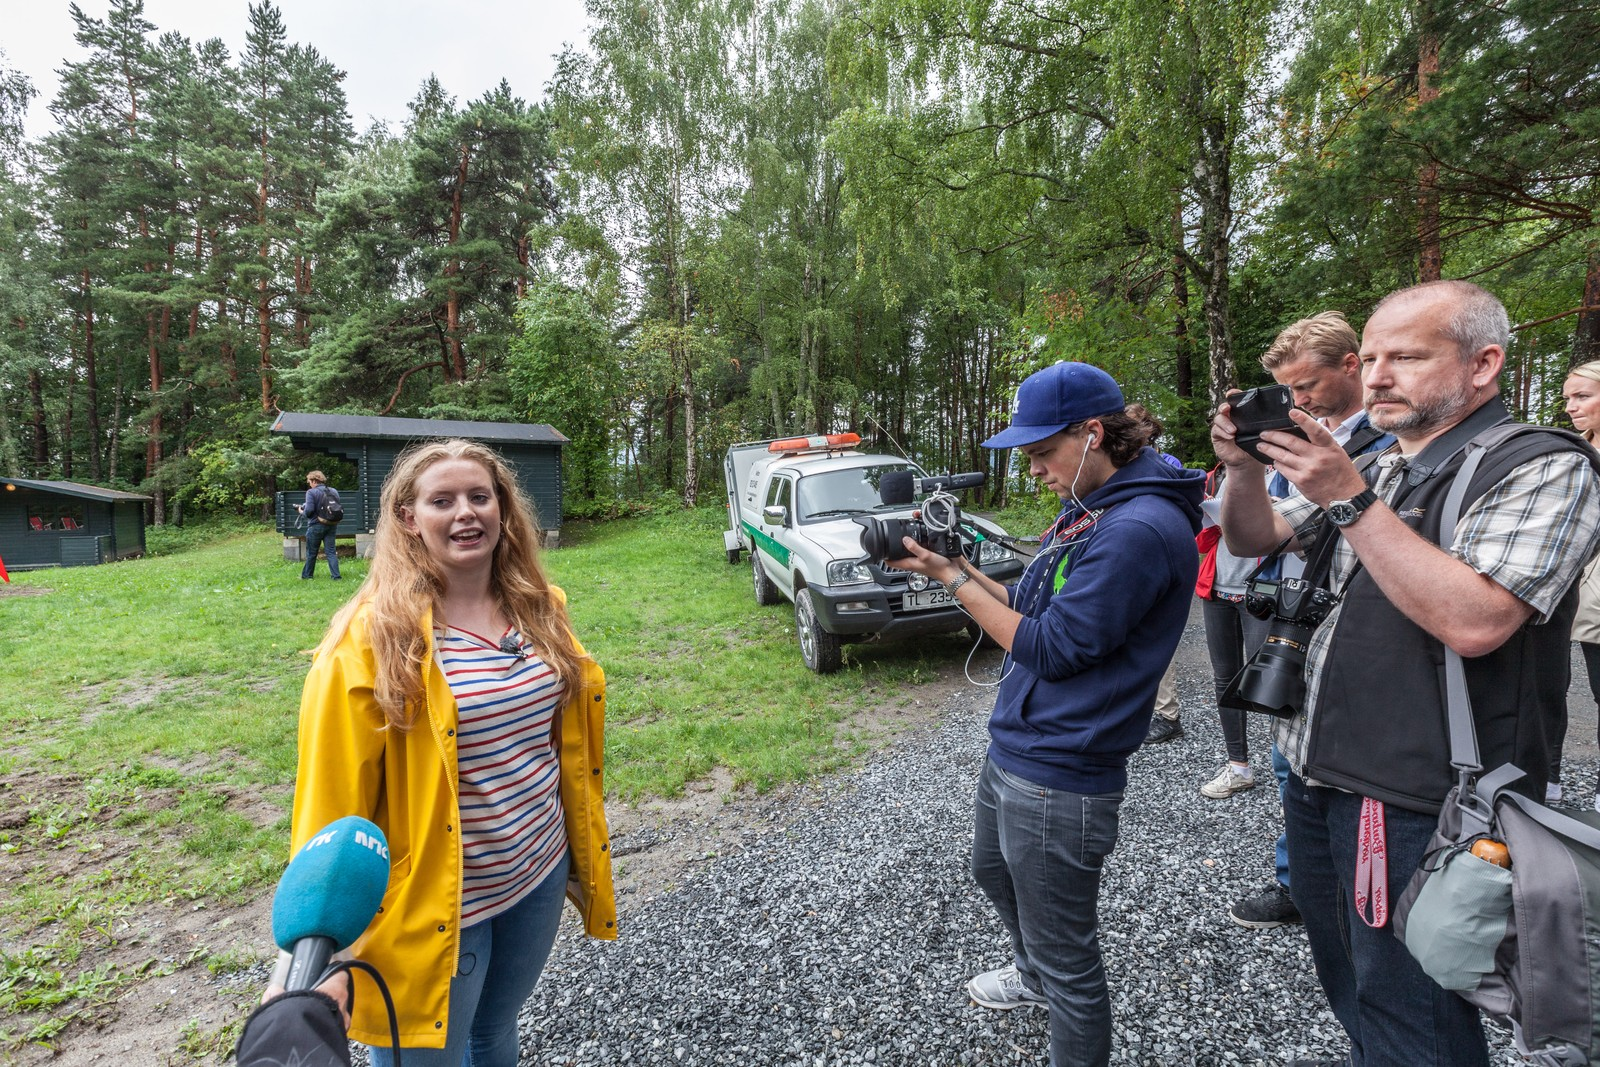 Emilie Bersaas viser pressen rundt på Utøya.